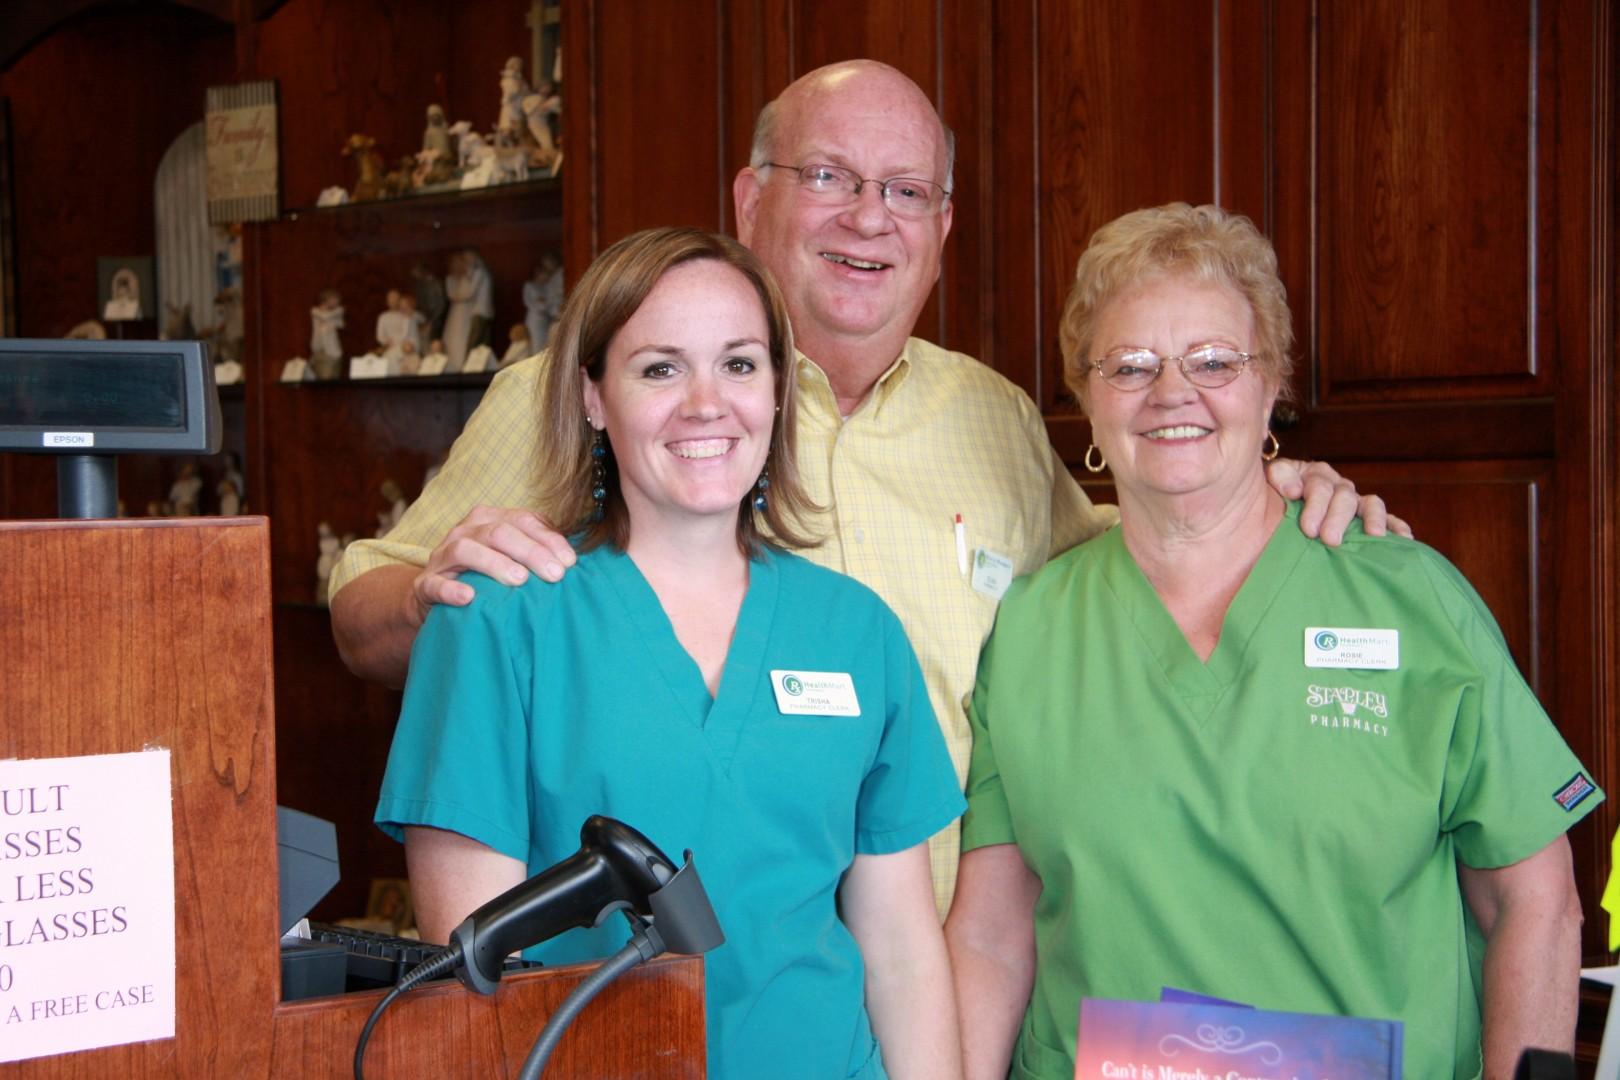 Stapley Family Pharmacy staff